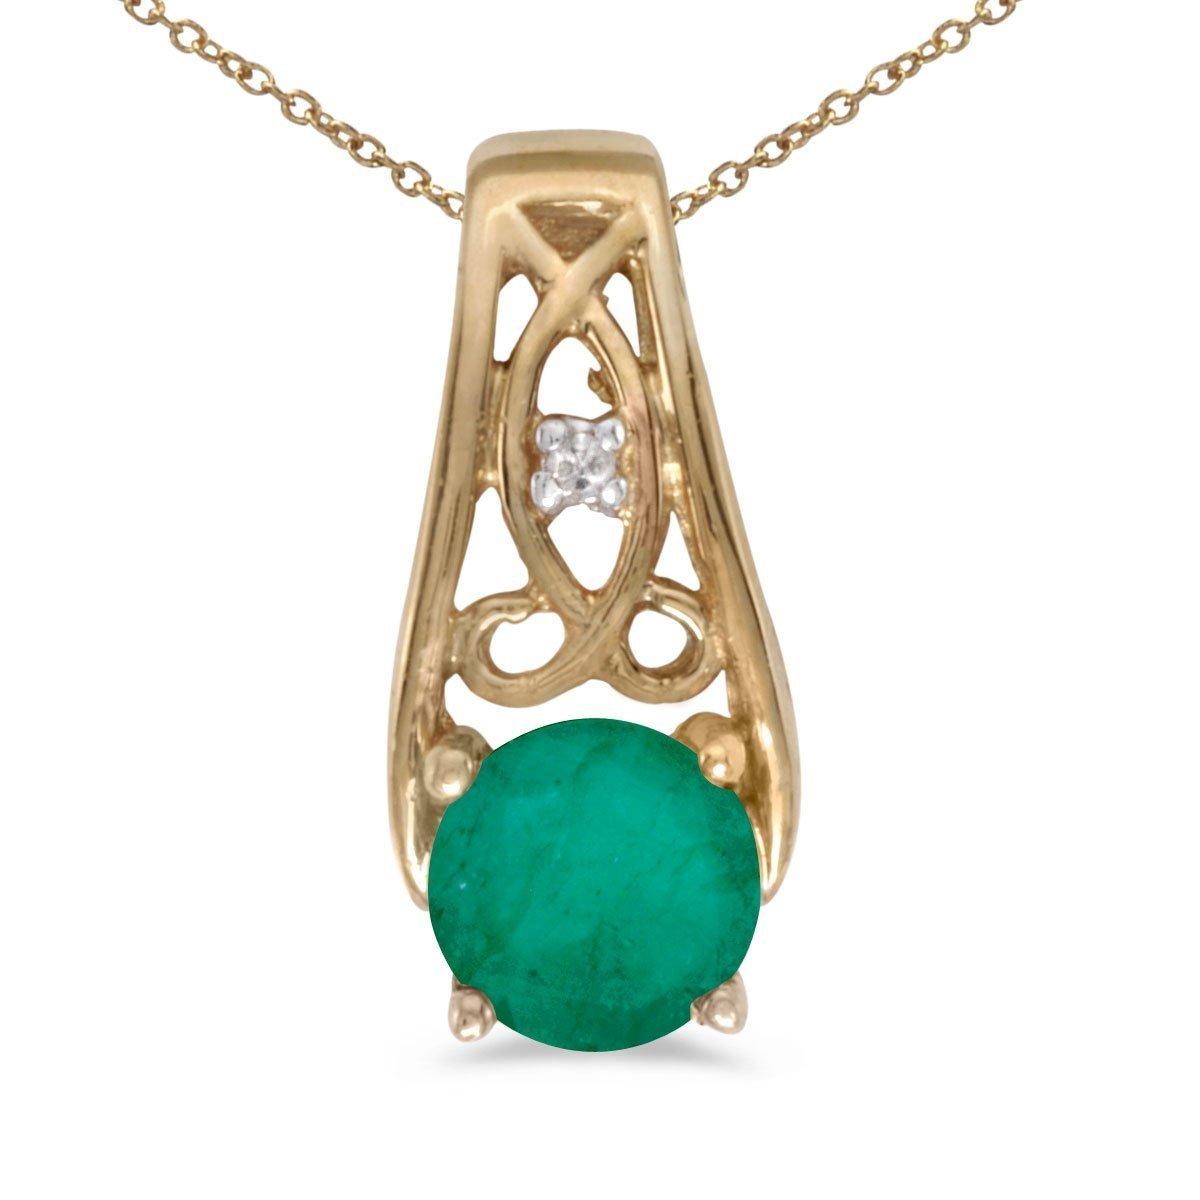 FB Jewels Solid 10k Yellow Gold Genuine Birthstone Round Gemstone And Diamond Pendant 0.42 Cttw.